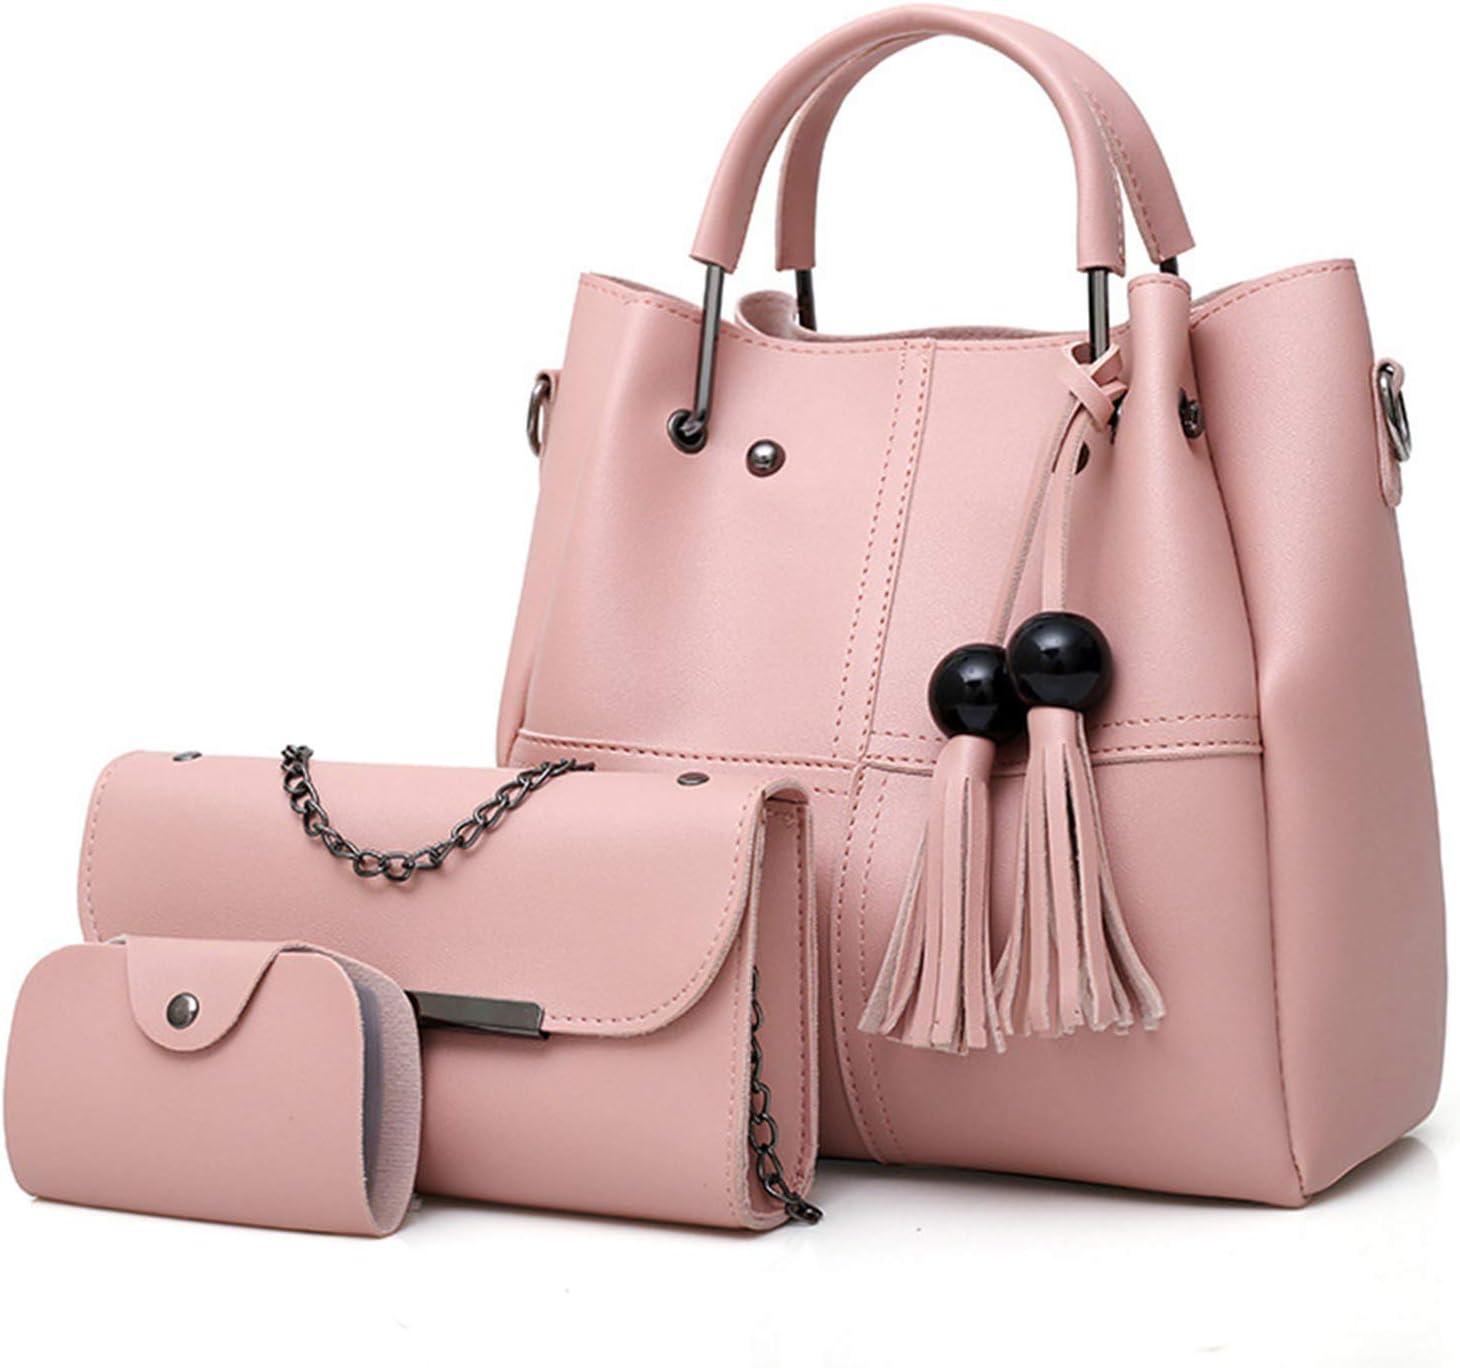 BAFEYU Finally popular brand Women's Handbags Fashion Manufacturer regenerated product PU Wallet Women Leather